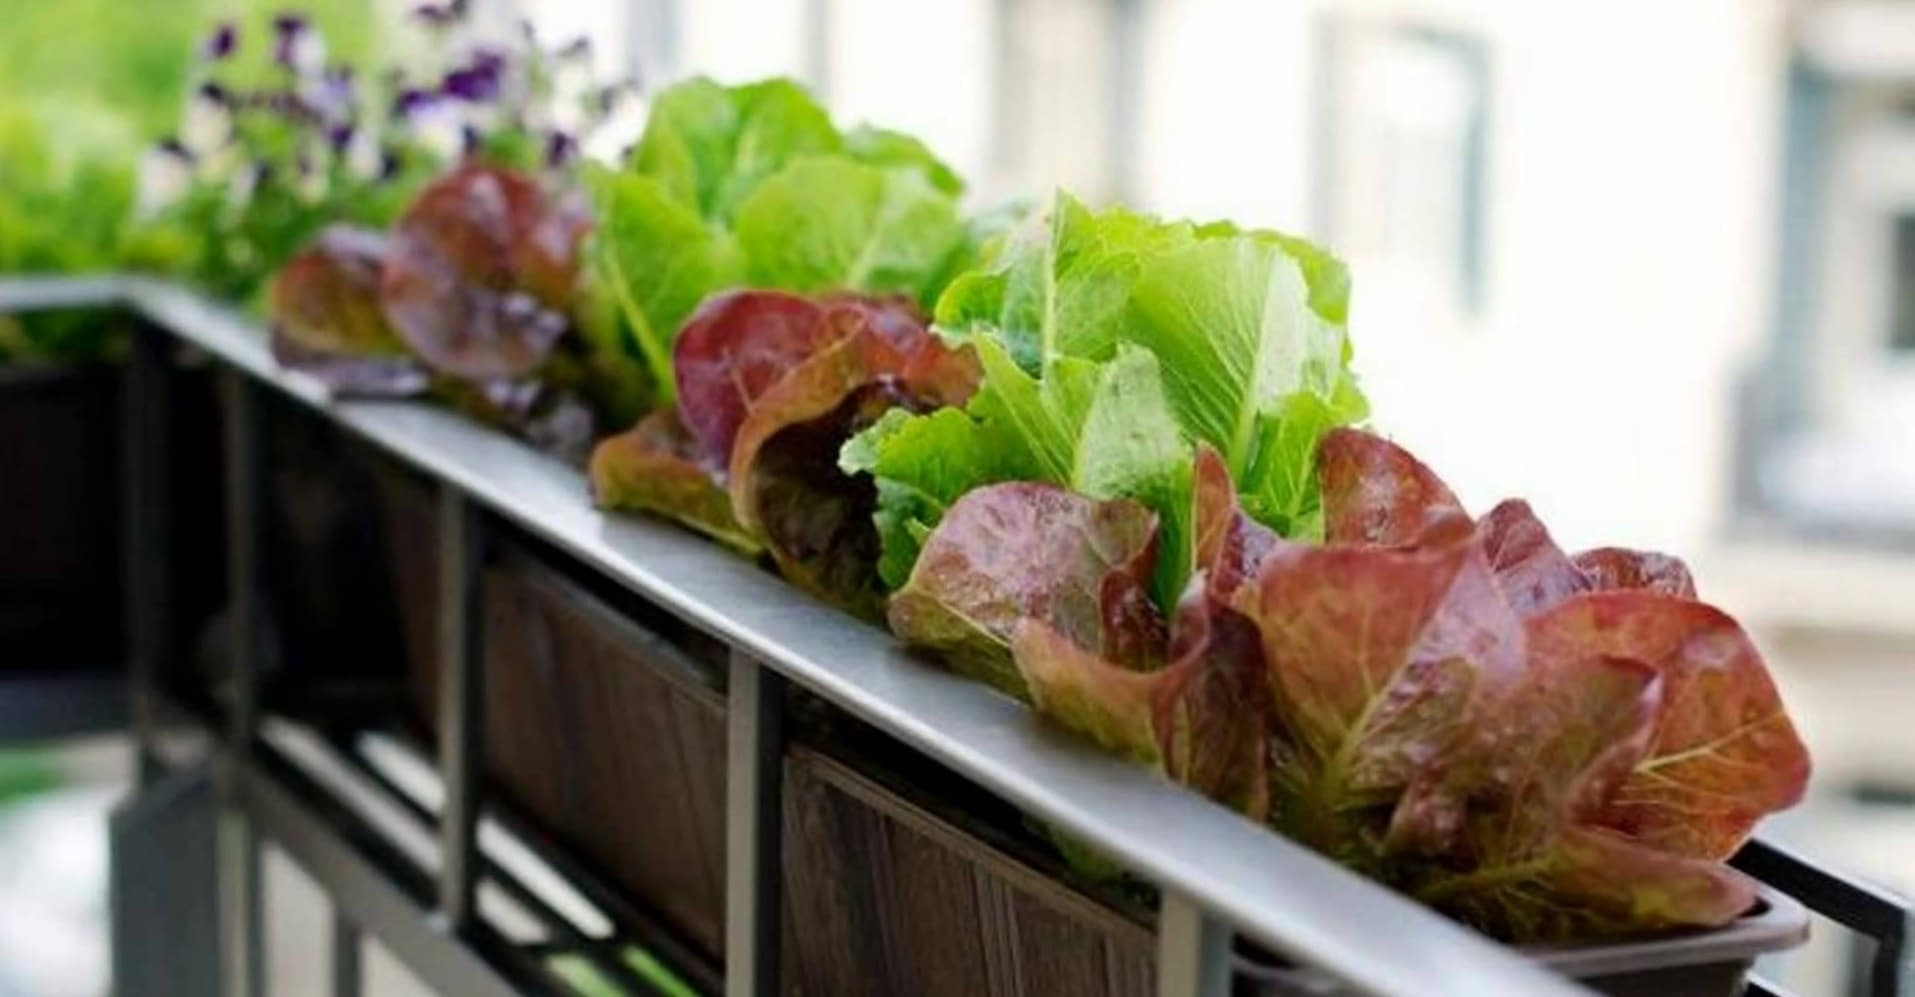 apartment-kitchen-garden-DIY-you must try